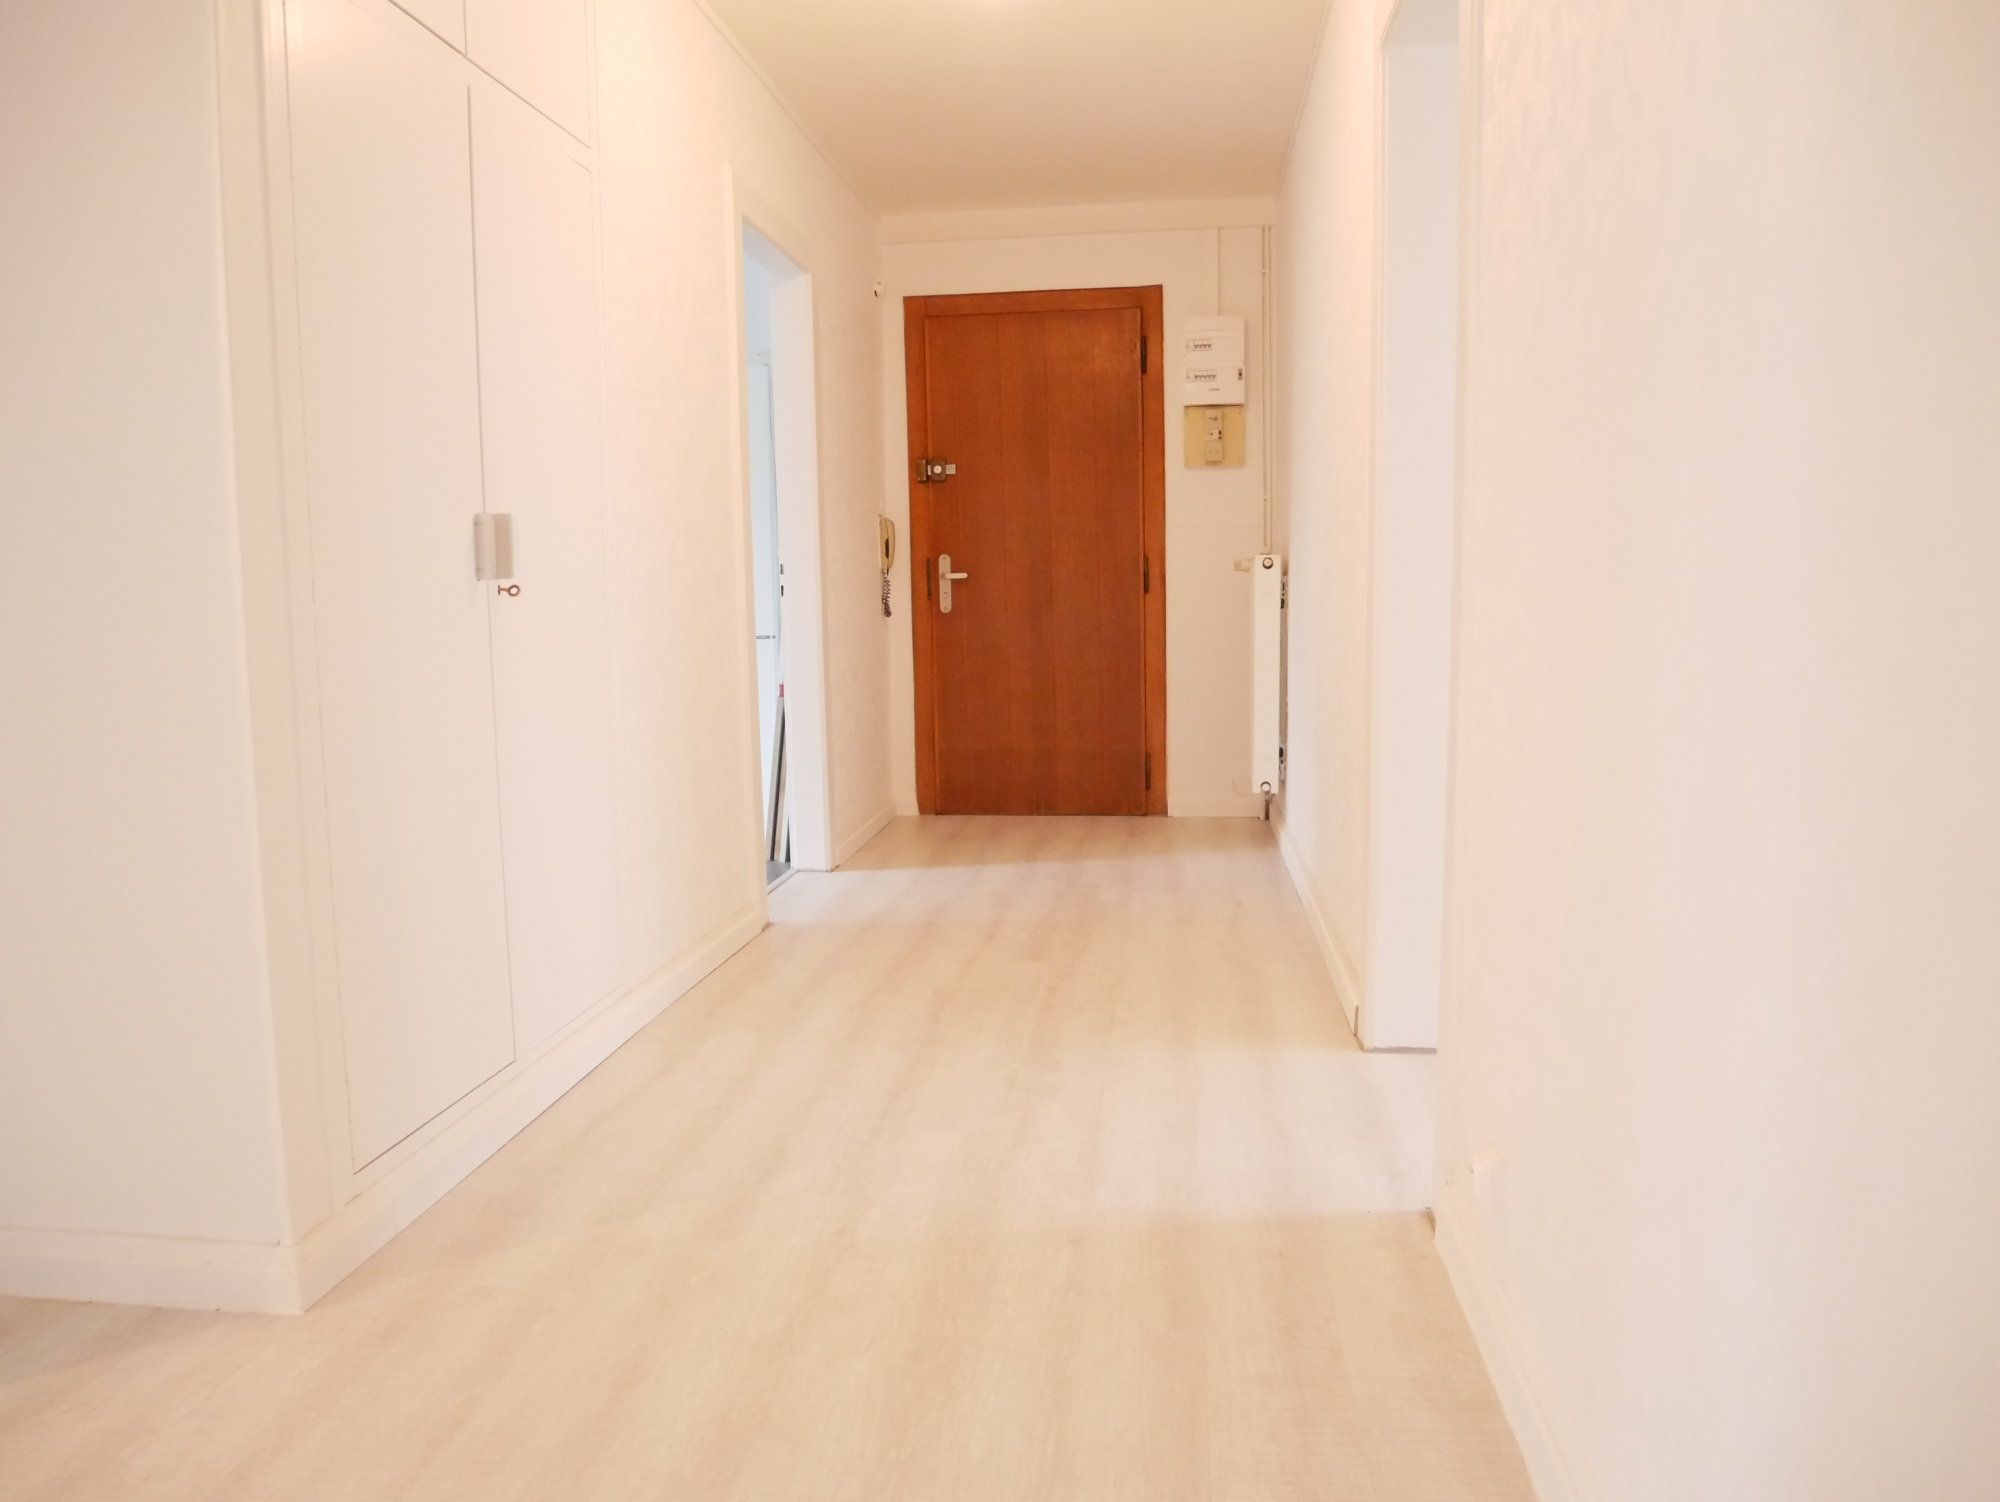 Lumineux appartement 3 pièces avec balcon - Strasbourg / Neudorf - nos ventes - Beausite Immobilier 5